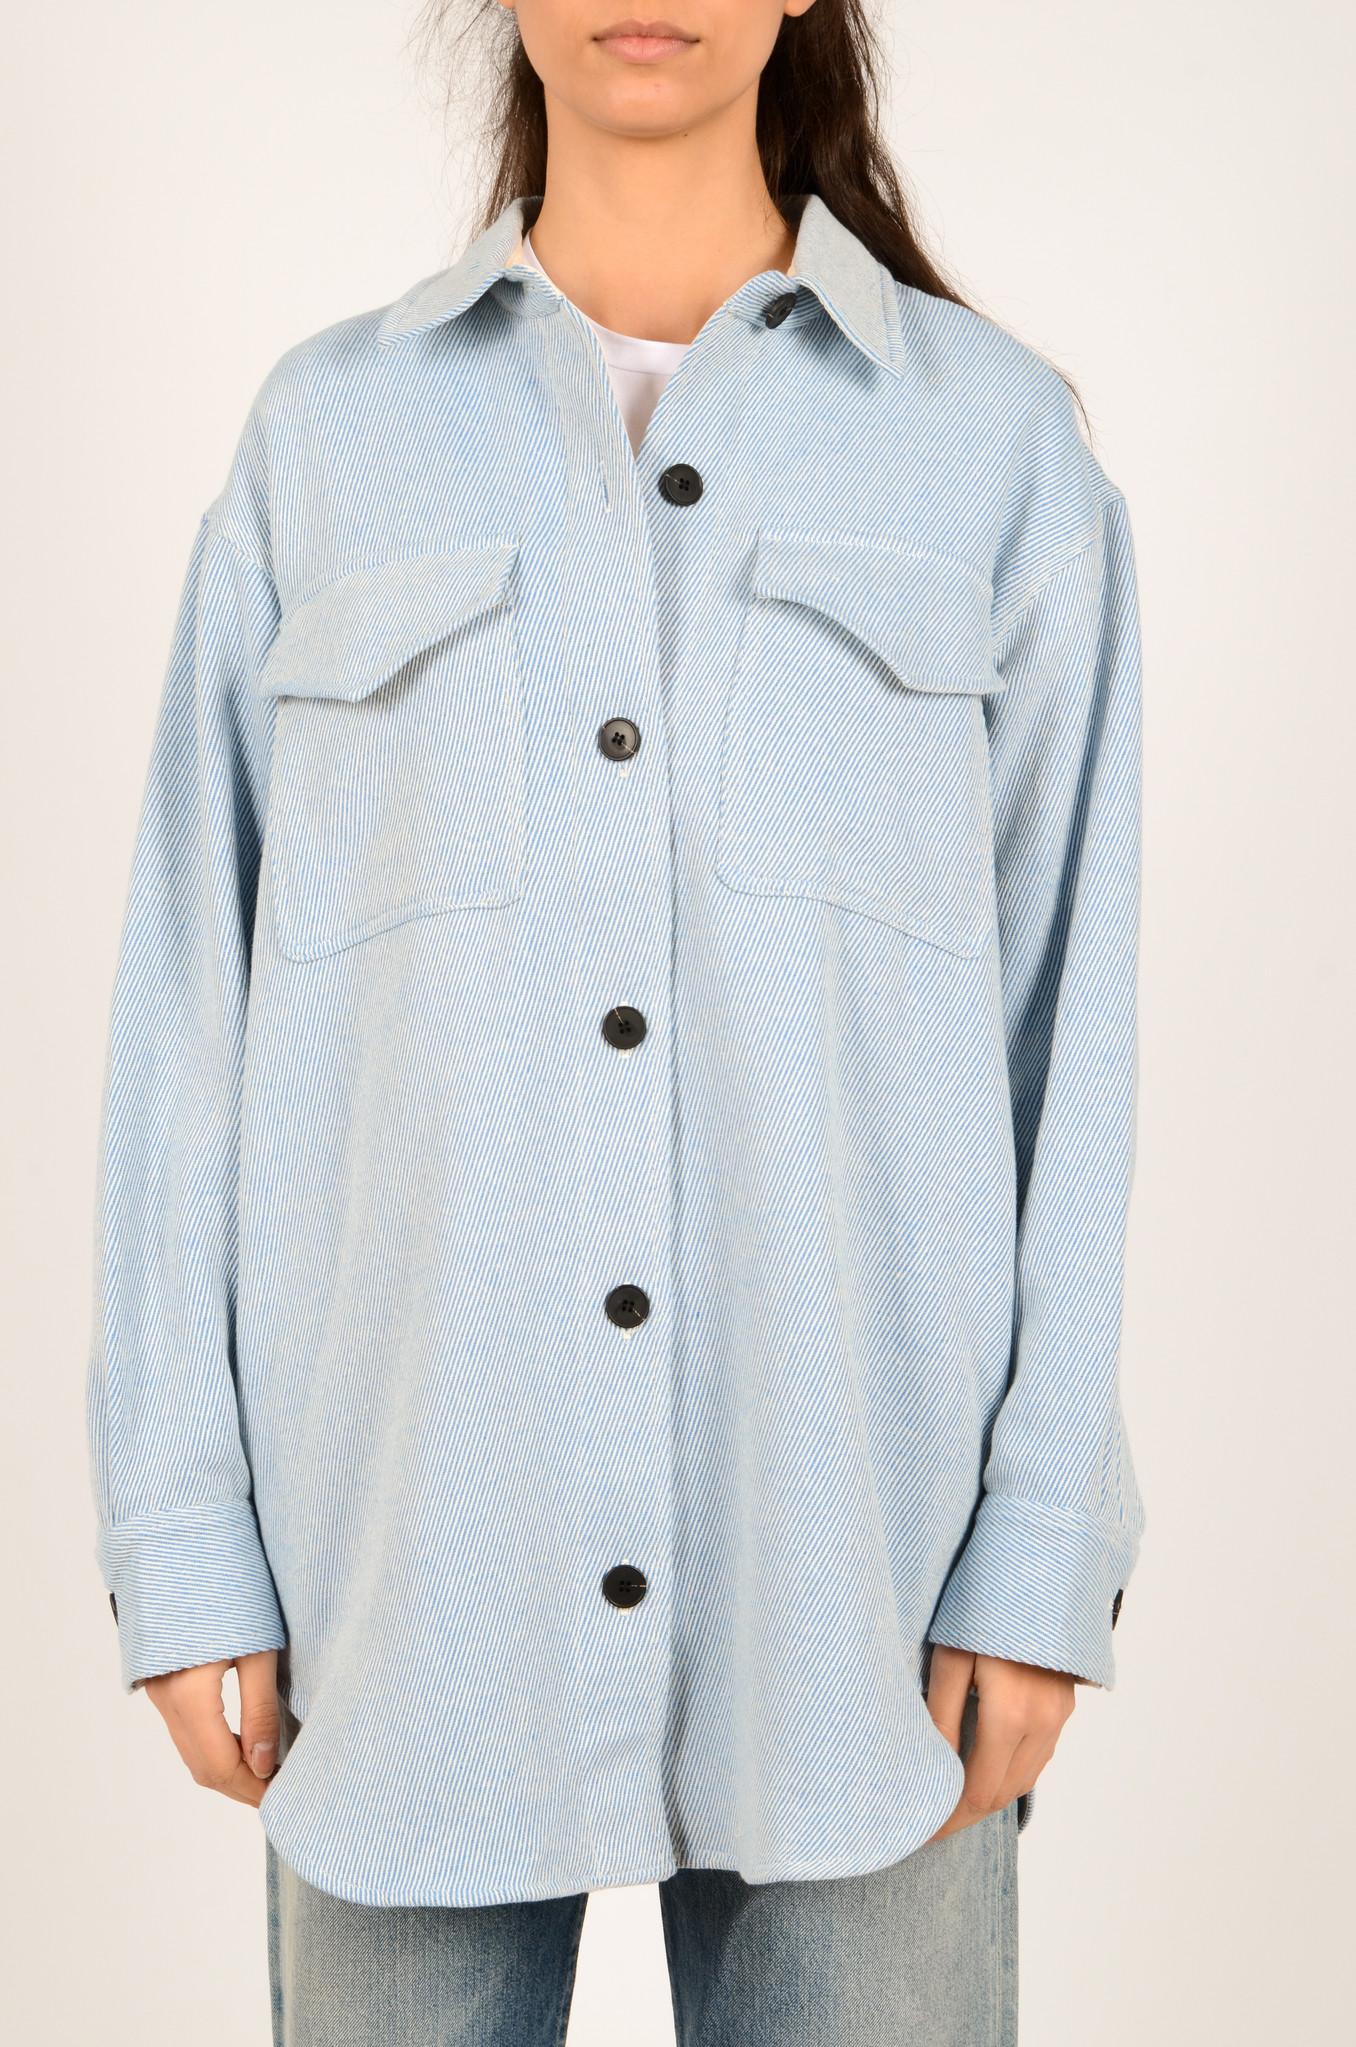 PALERMO SHIRT COAT IN DUSTY BLUE-1